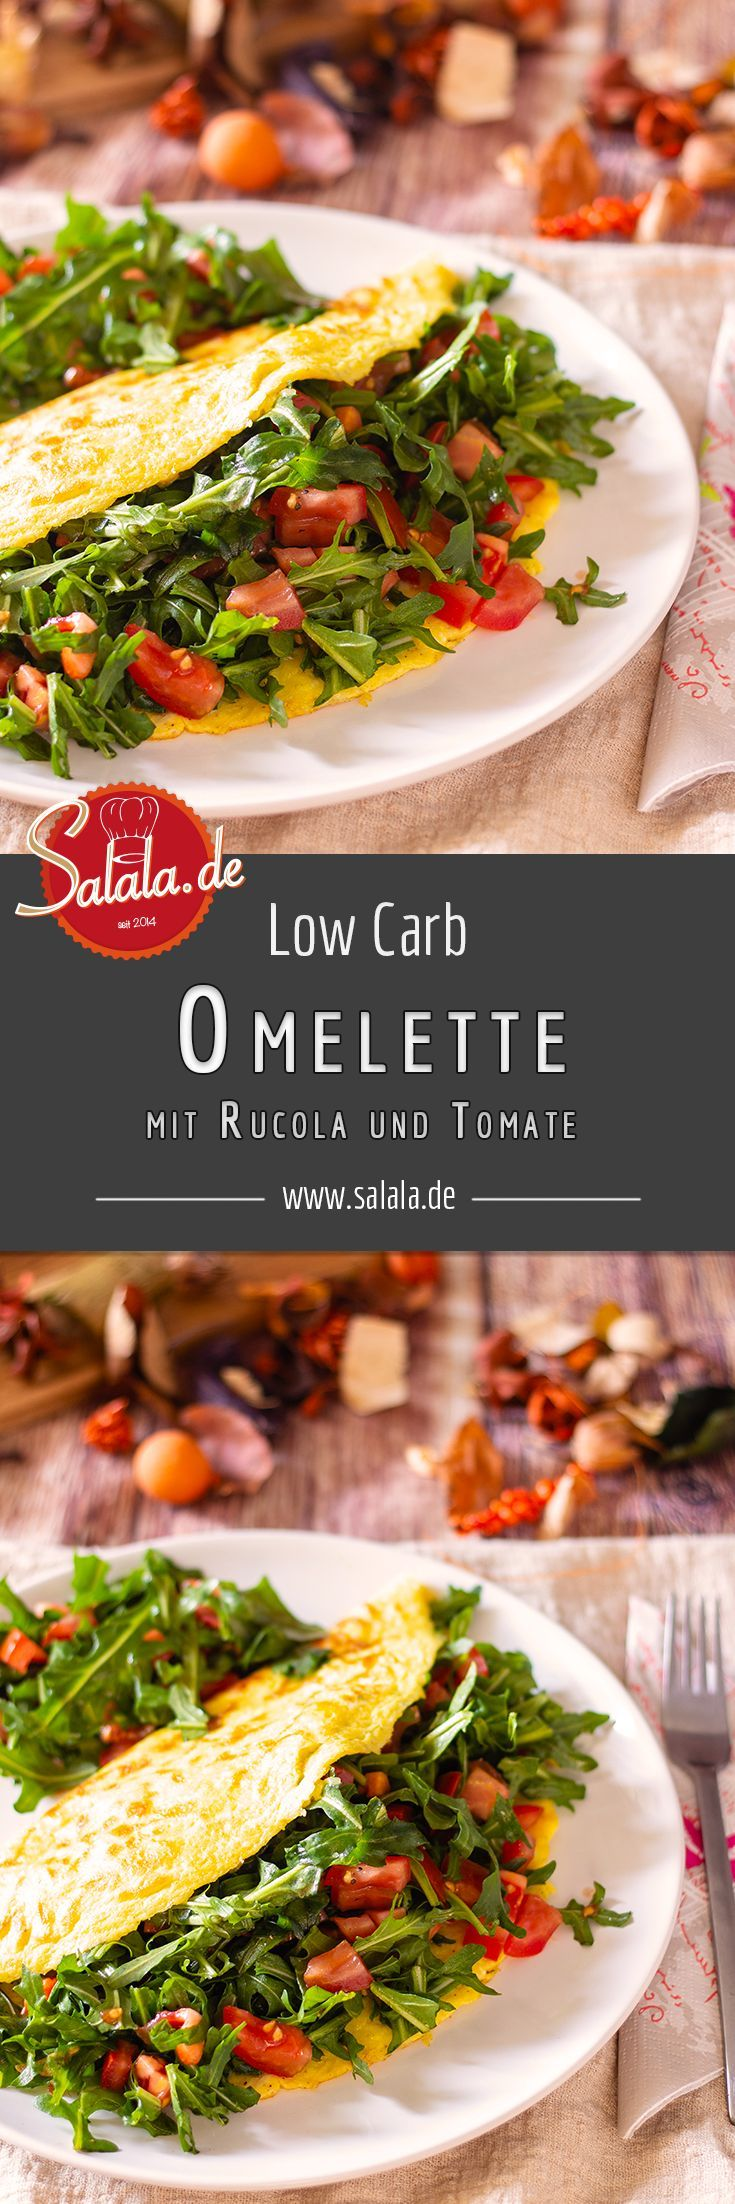 Tomate-Ruccola-Omelette – Leckere LCHF Rezept-Ideen